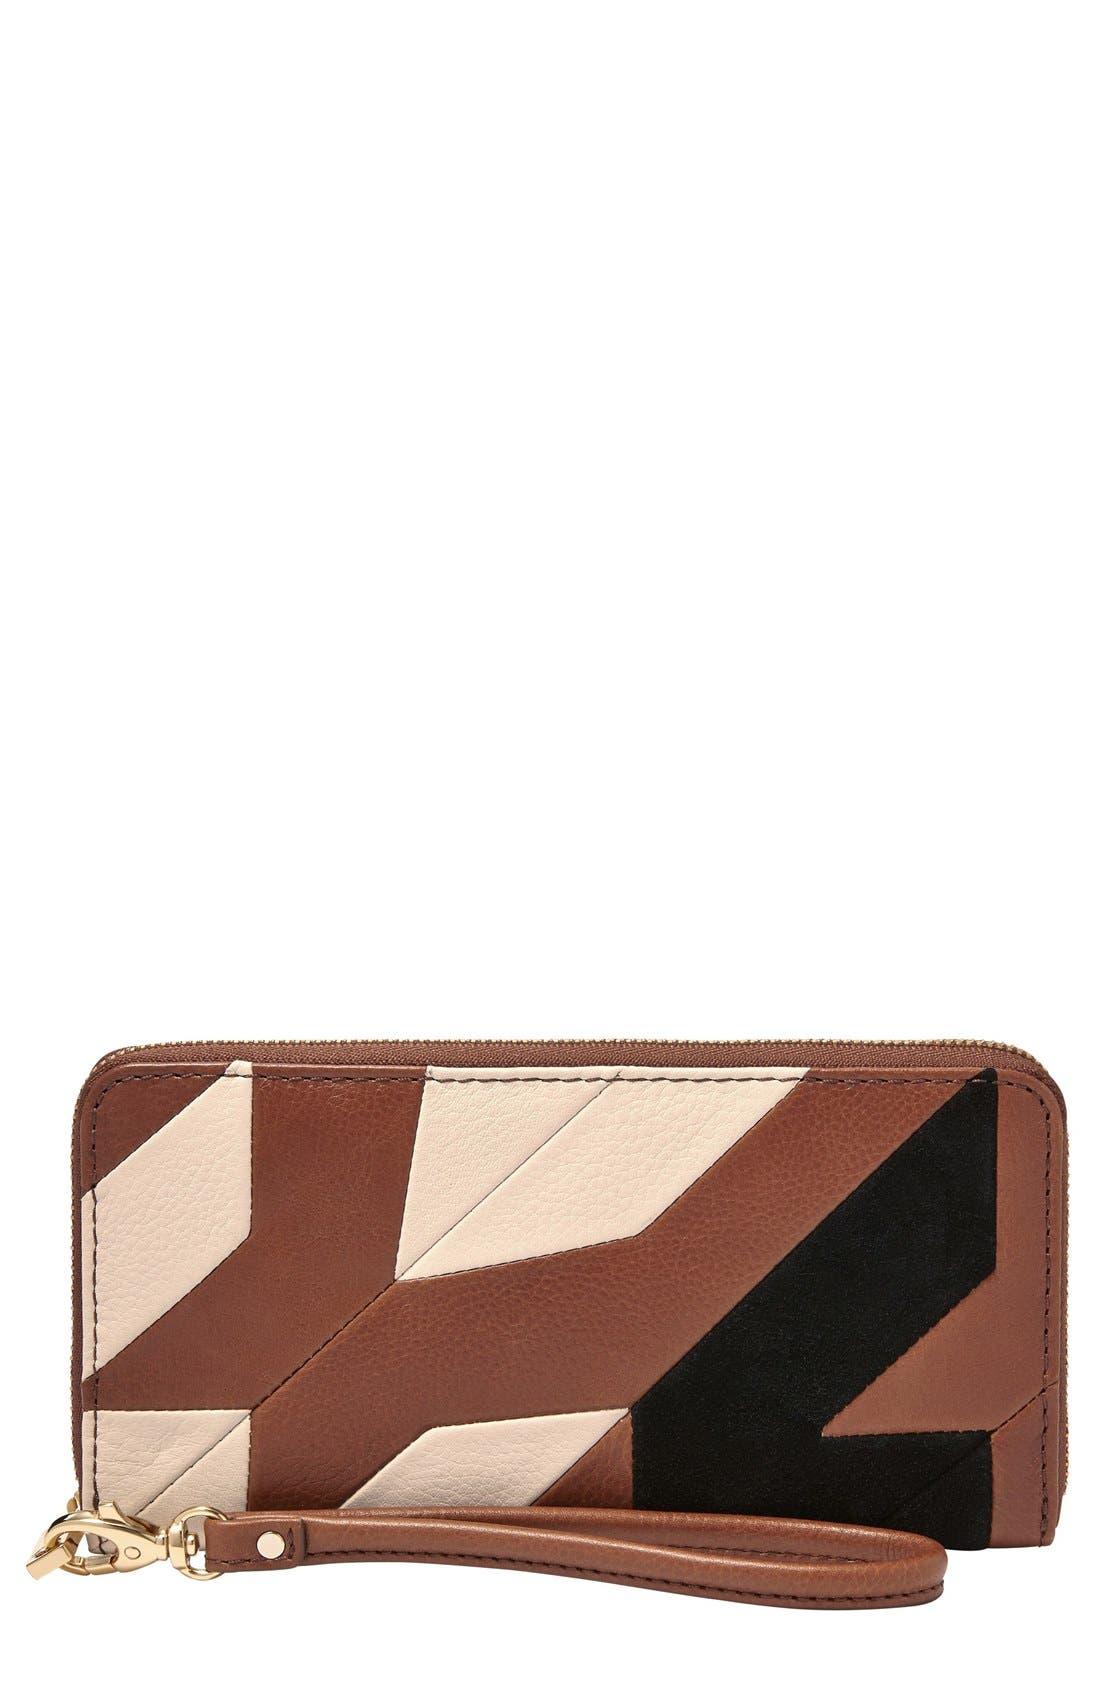 Alternate Image 1 Selected - Fossil 'Sydney' Colorblock Zip Clutch Wallet